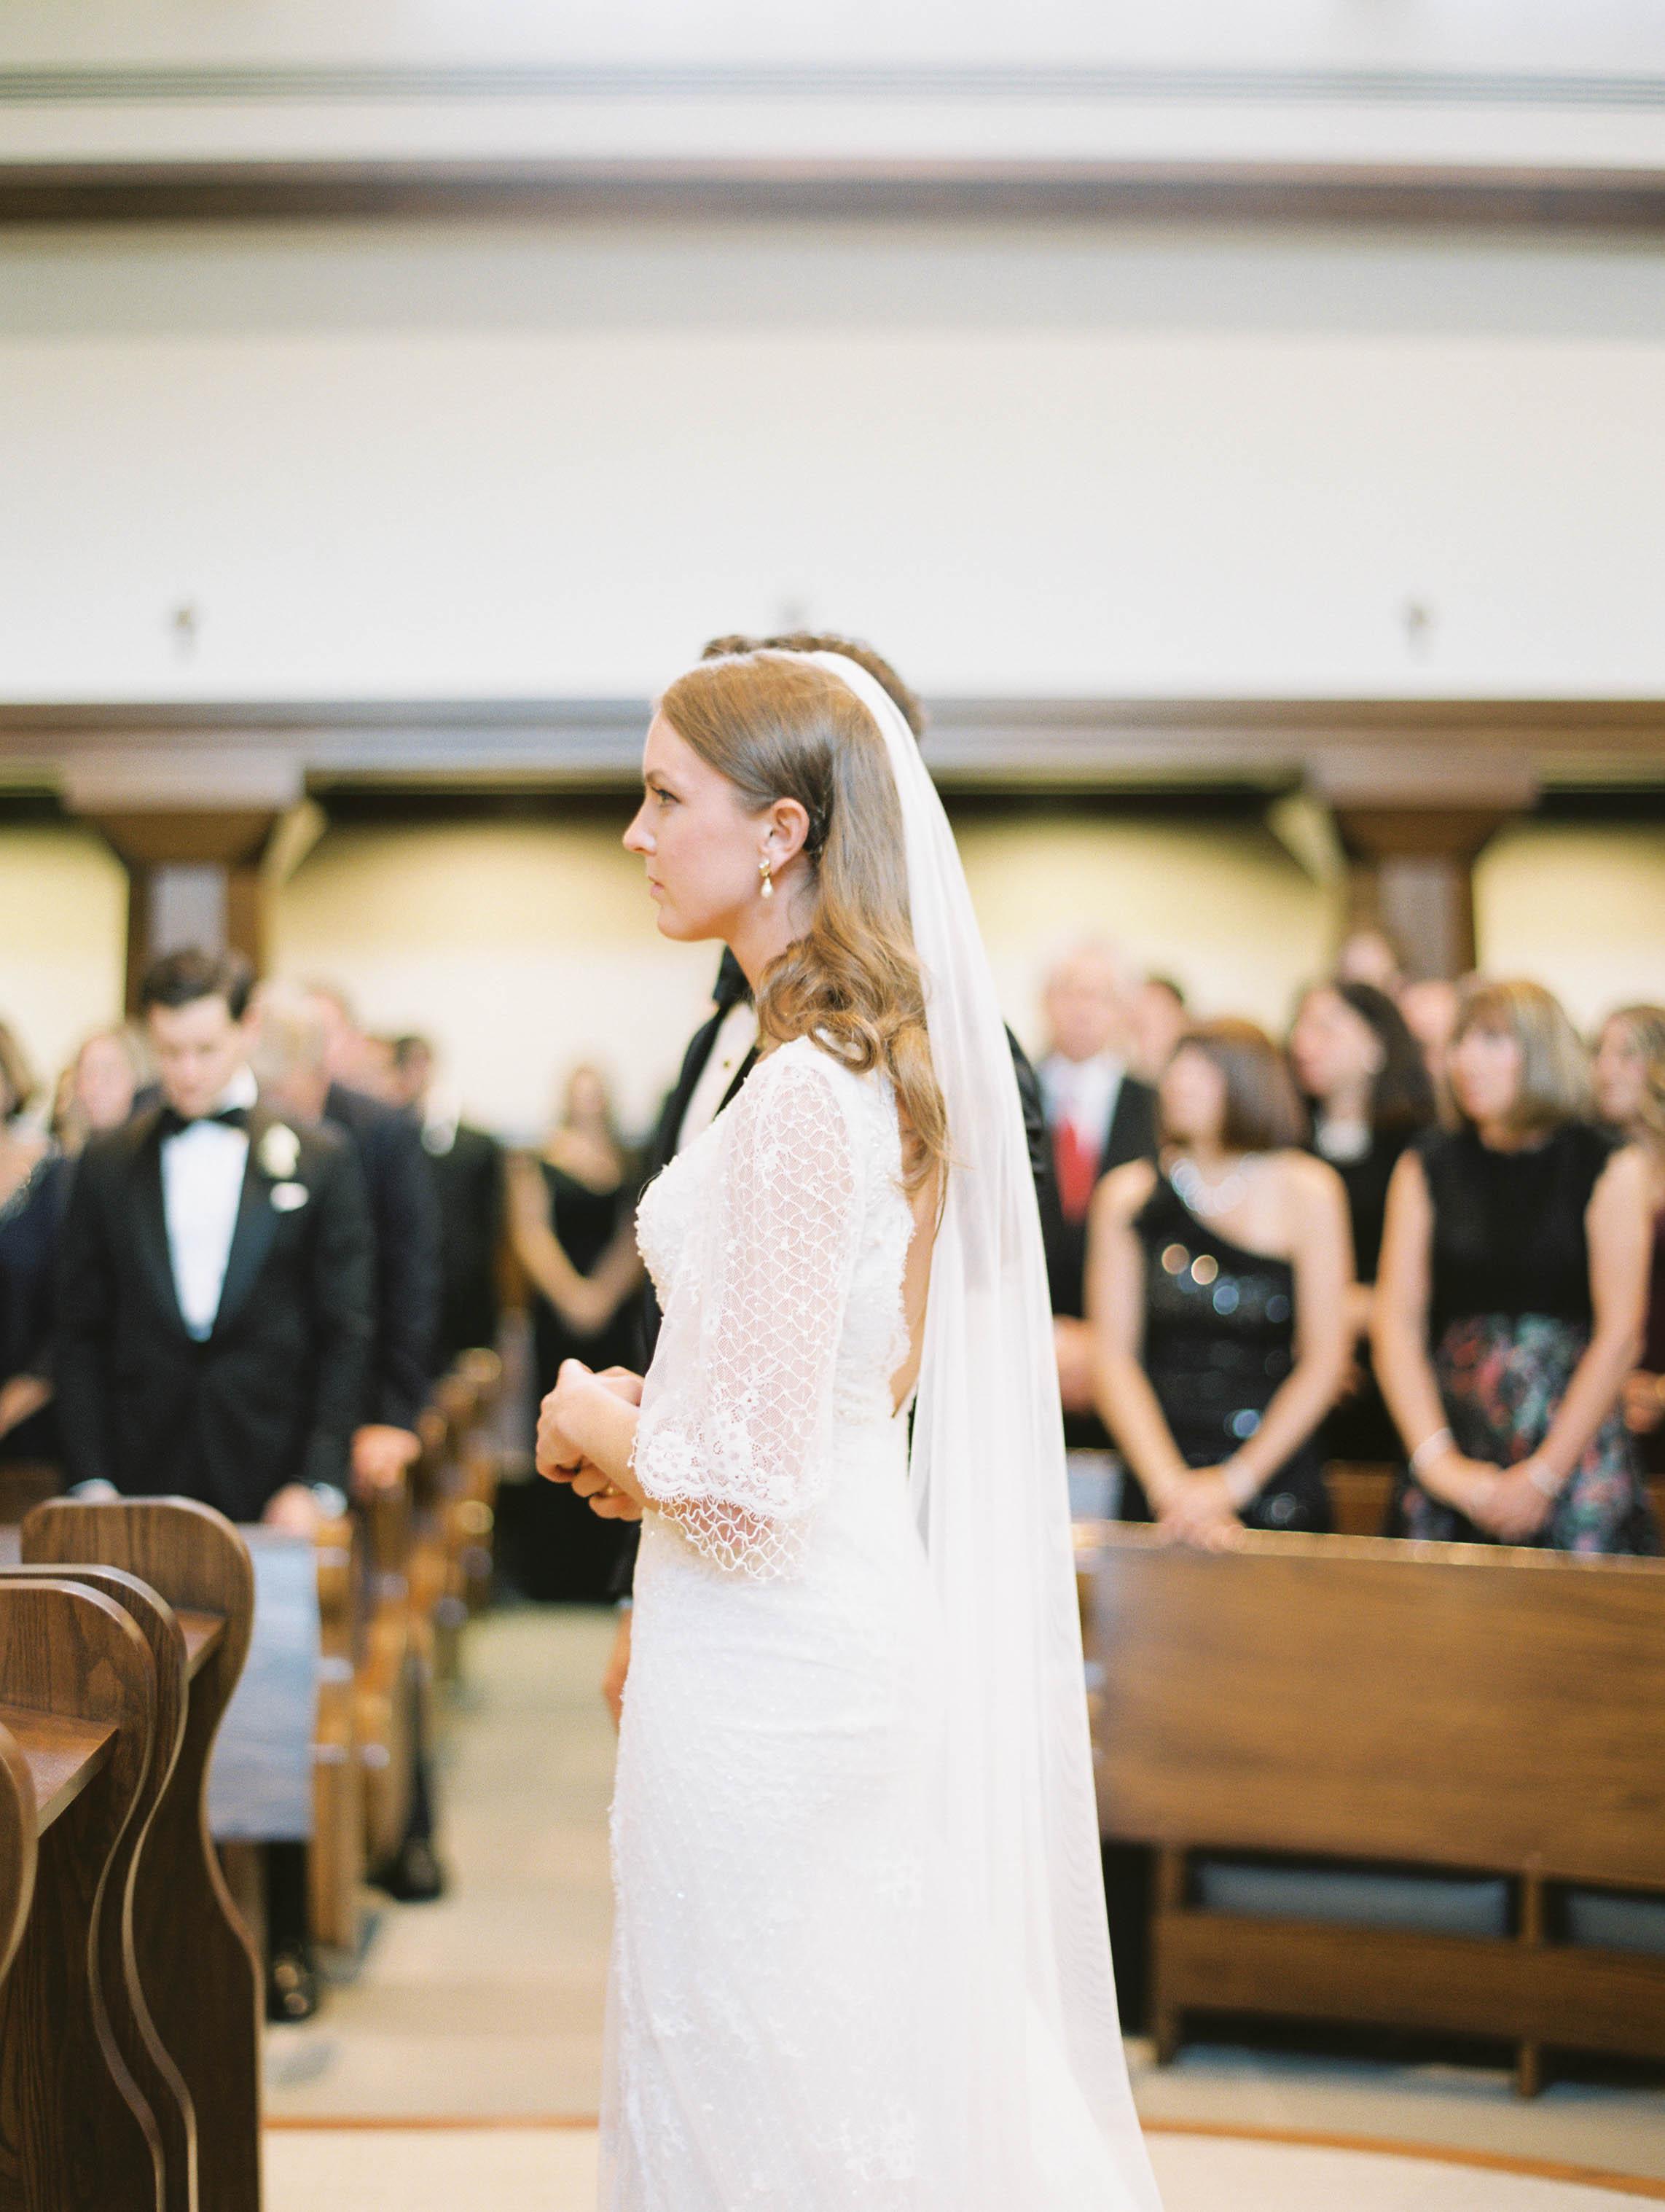 kelsandmichael_weddingphotography_rhodeislandwedding-30.jpg